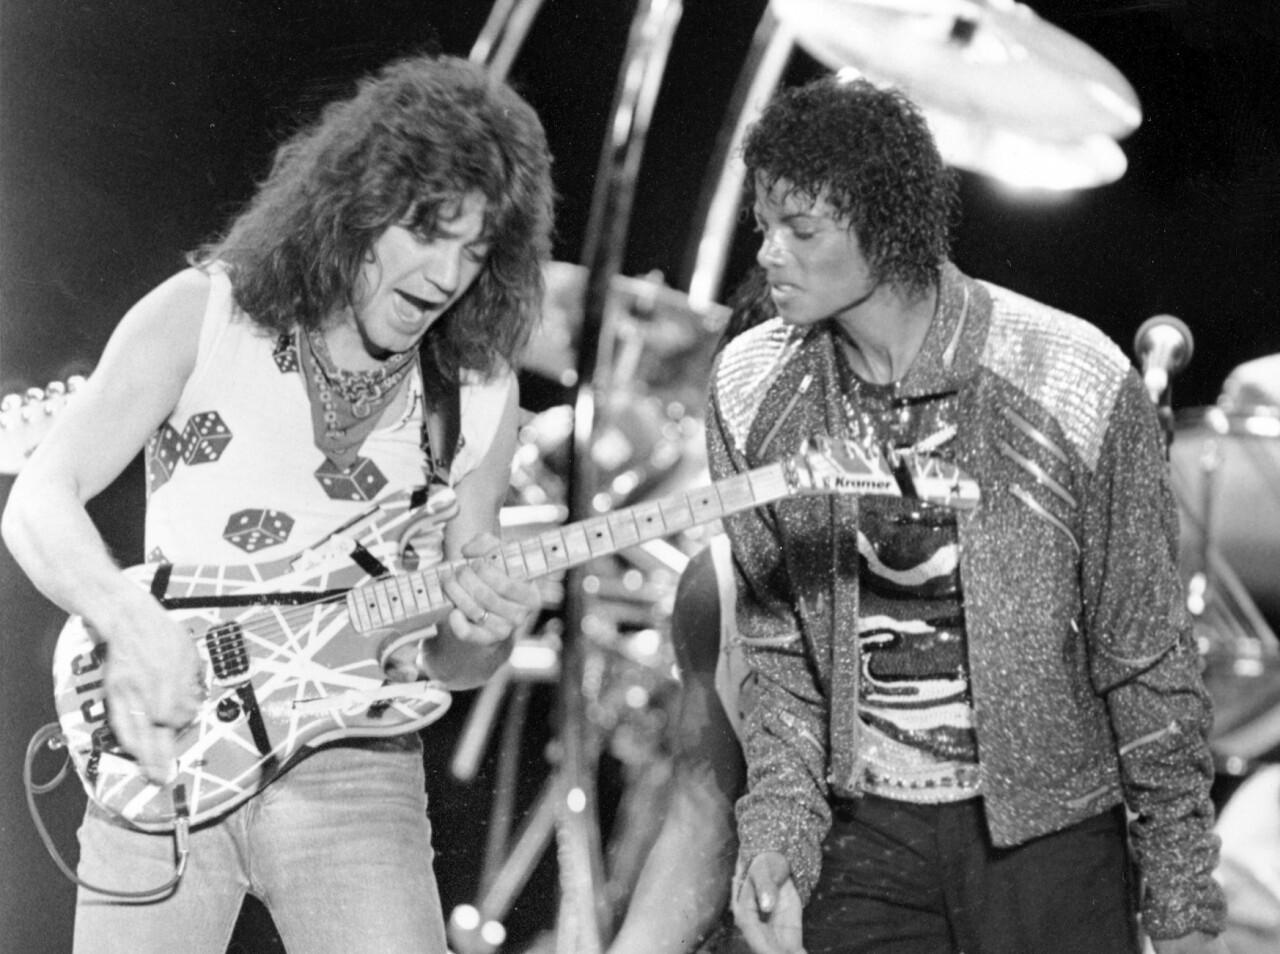 Eddie Van Halen performs with Michael Jackson in 1984